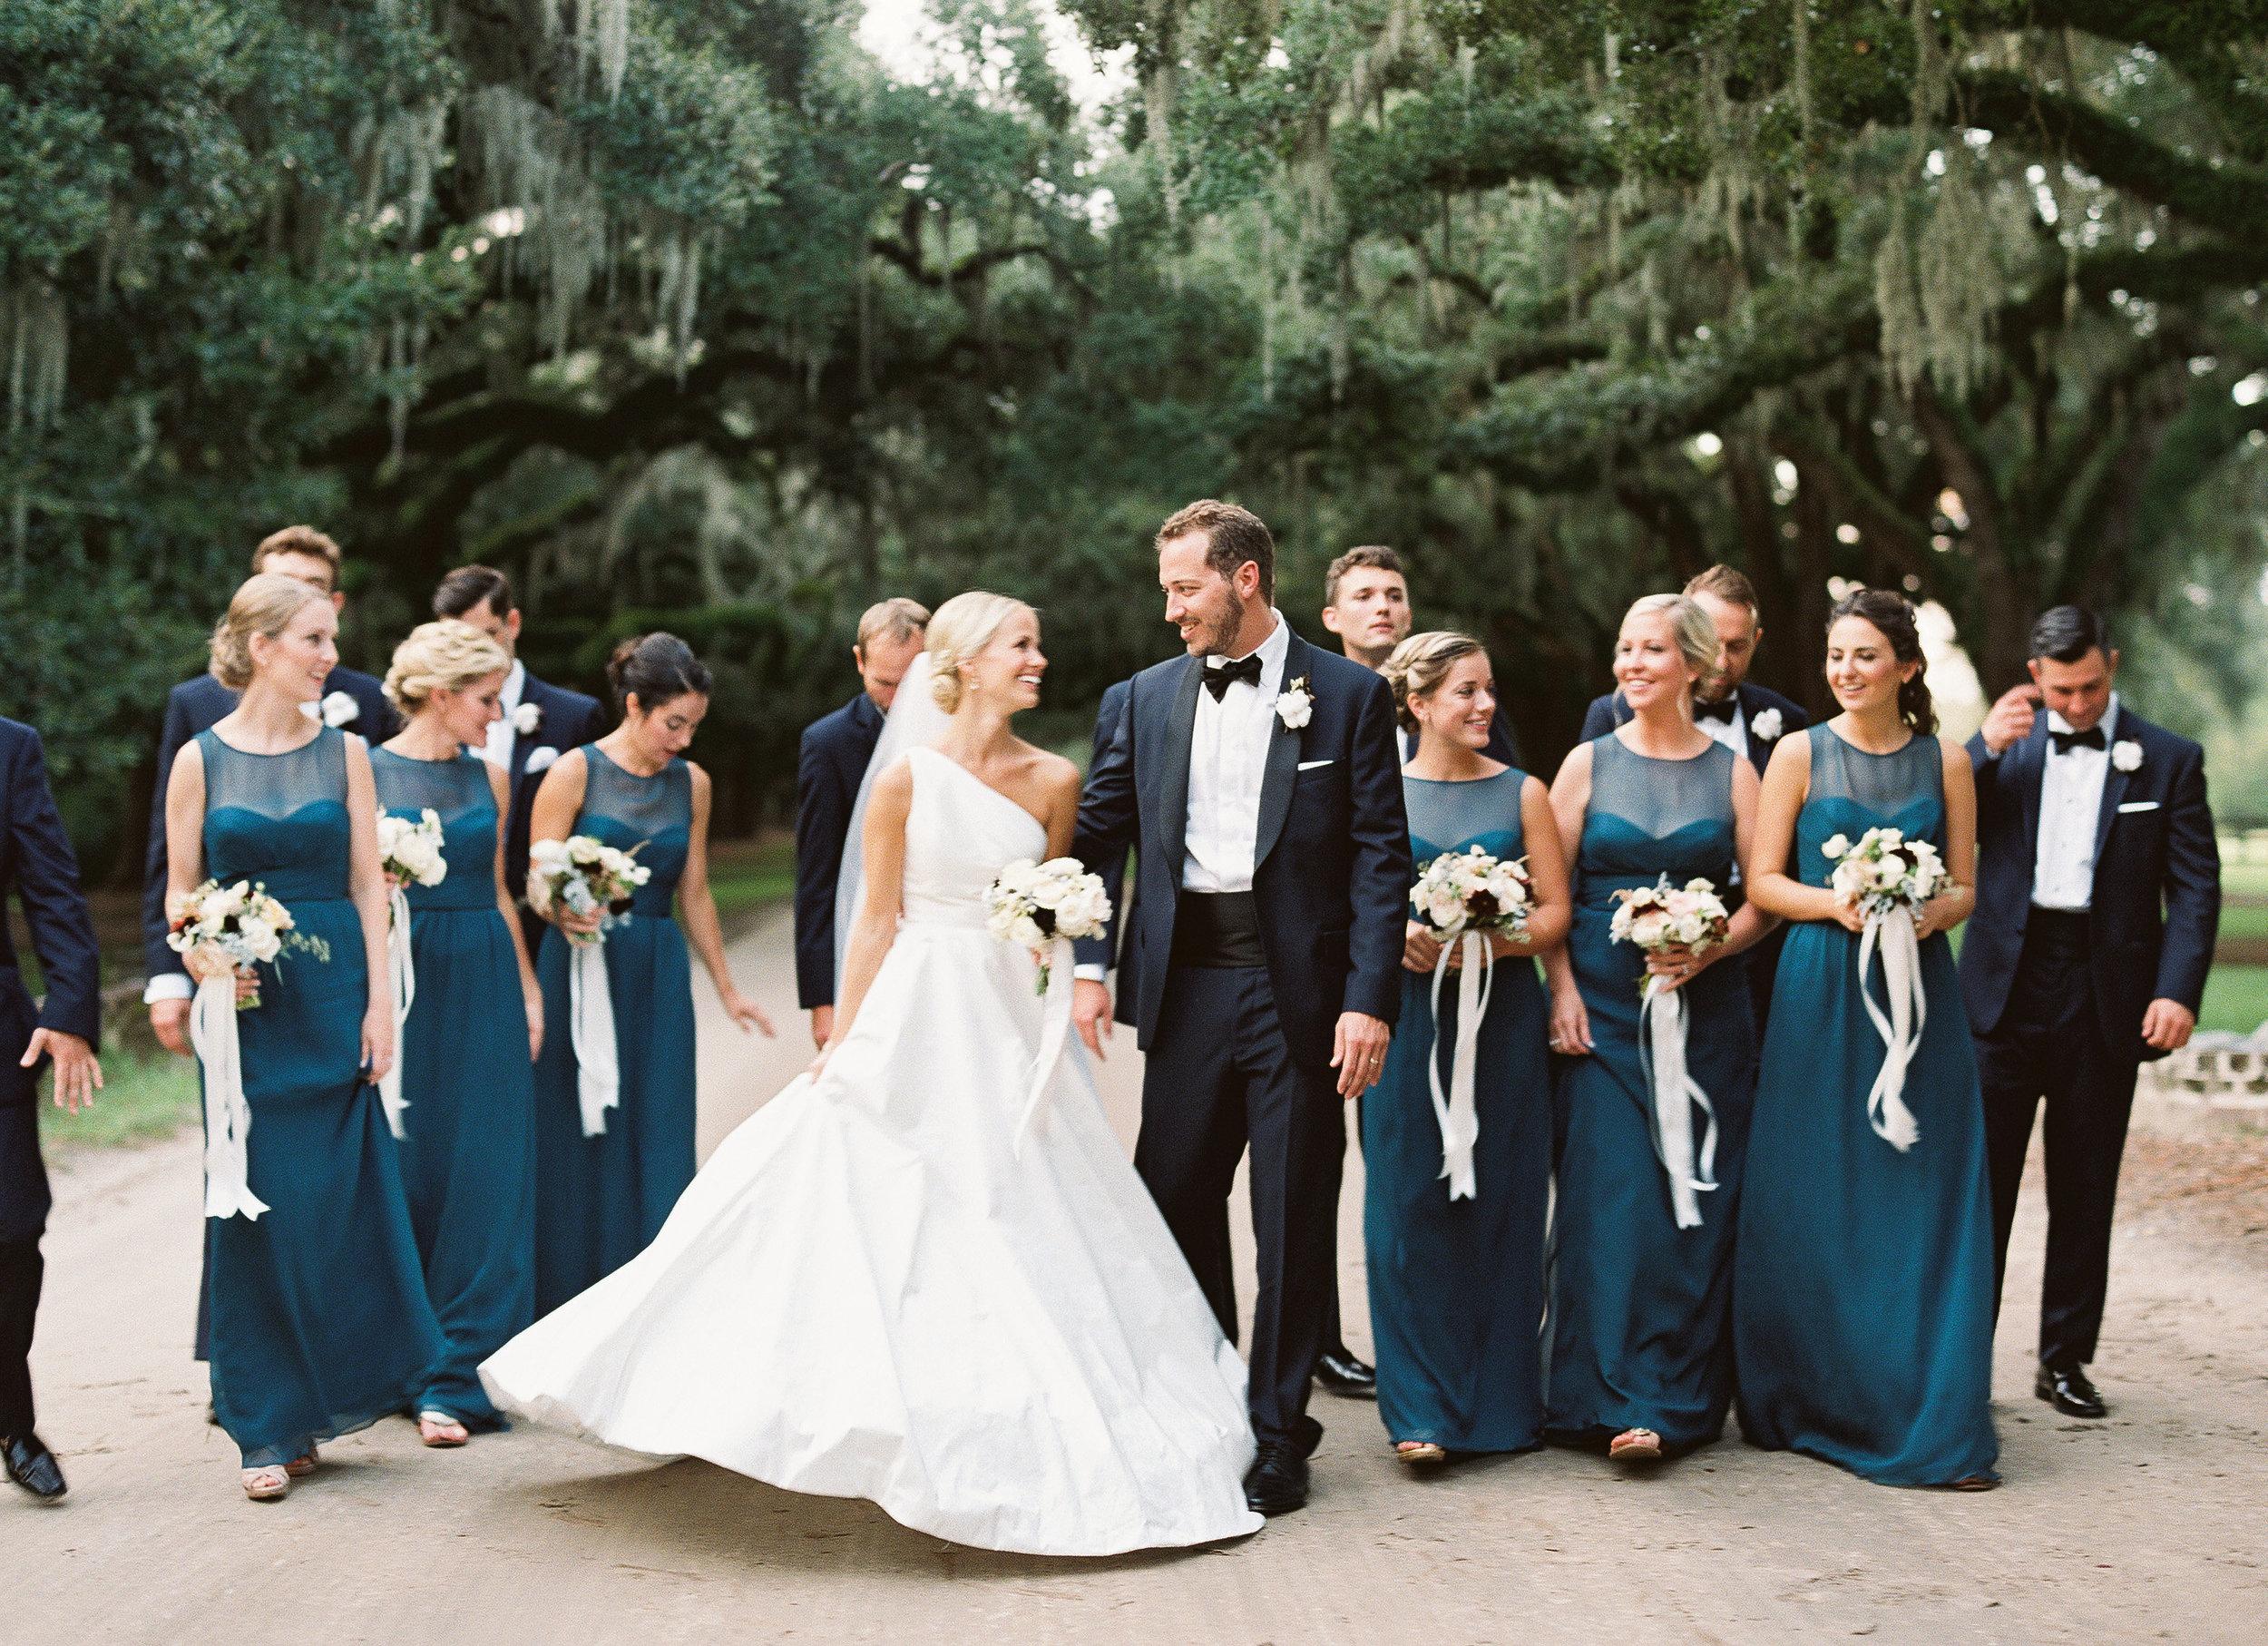 Boone Hall Plantation wedding portraits Fall wedding reception decor with blue accents at Boone Hall Plantation  //  Wedding photography by Landon Jacob  //  A Lowcountry Wedding Magazine